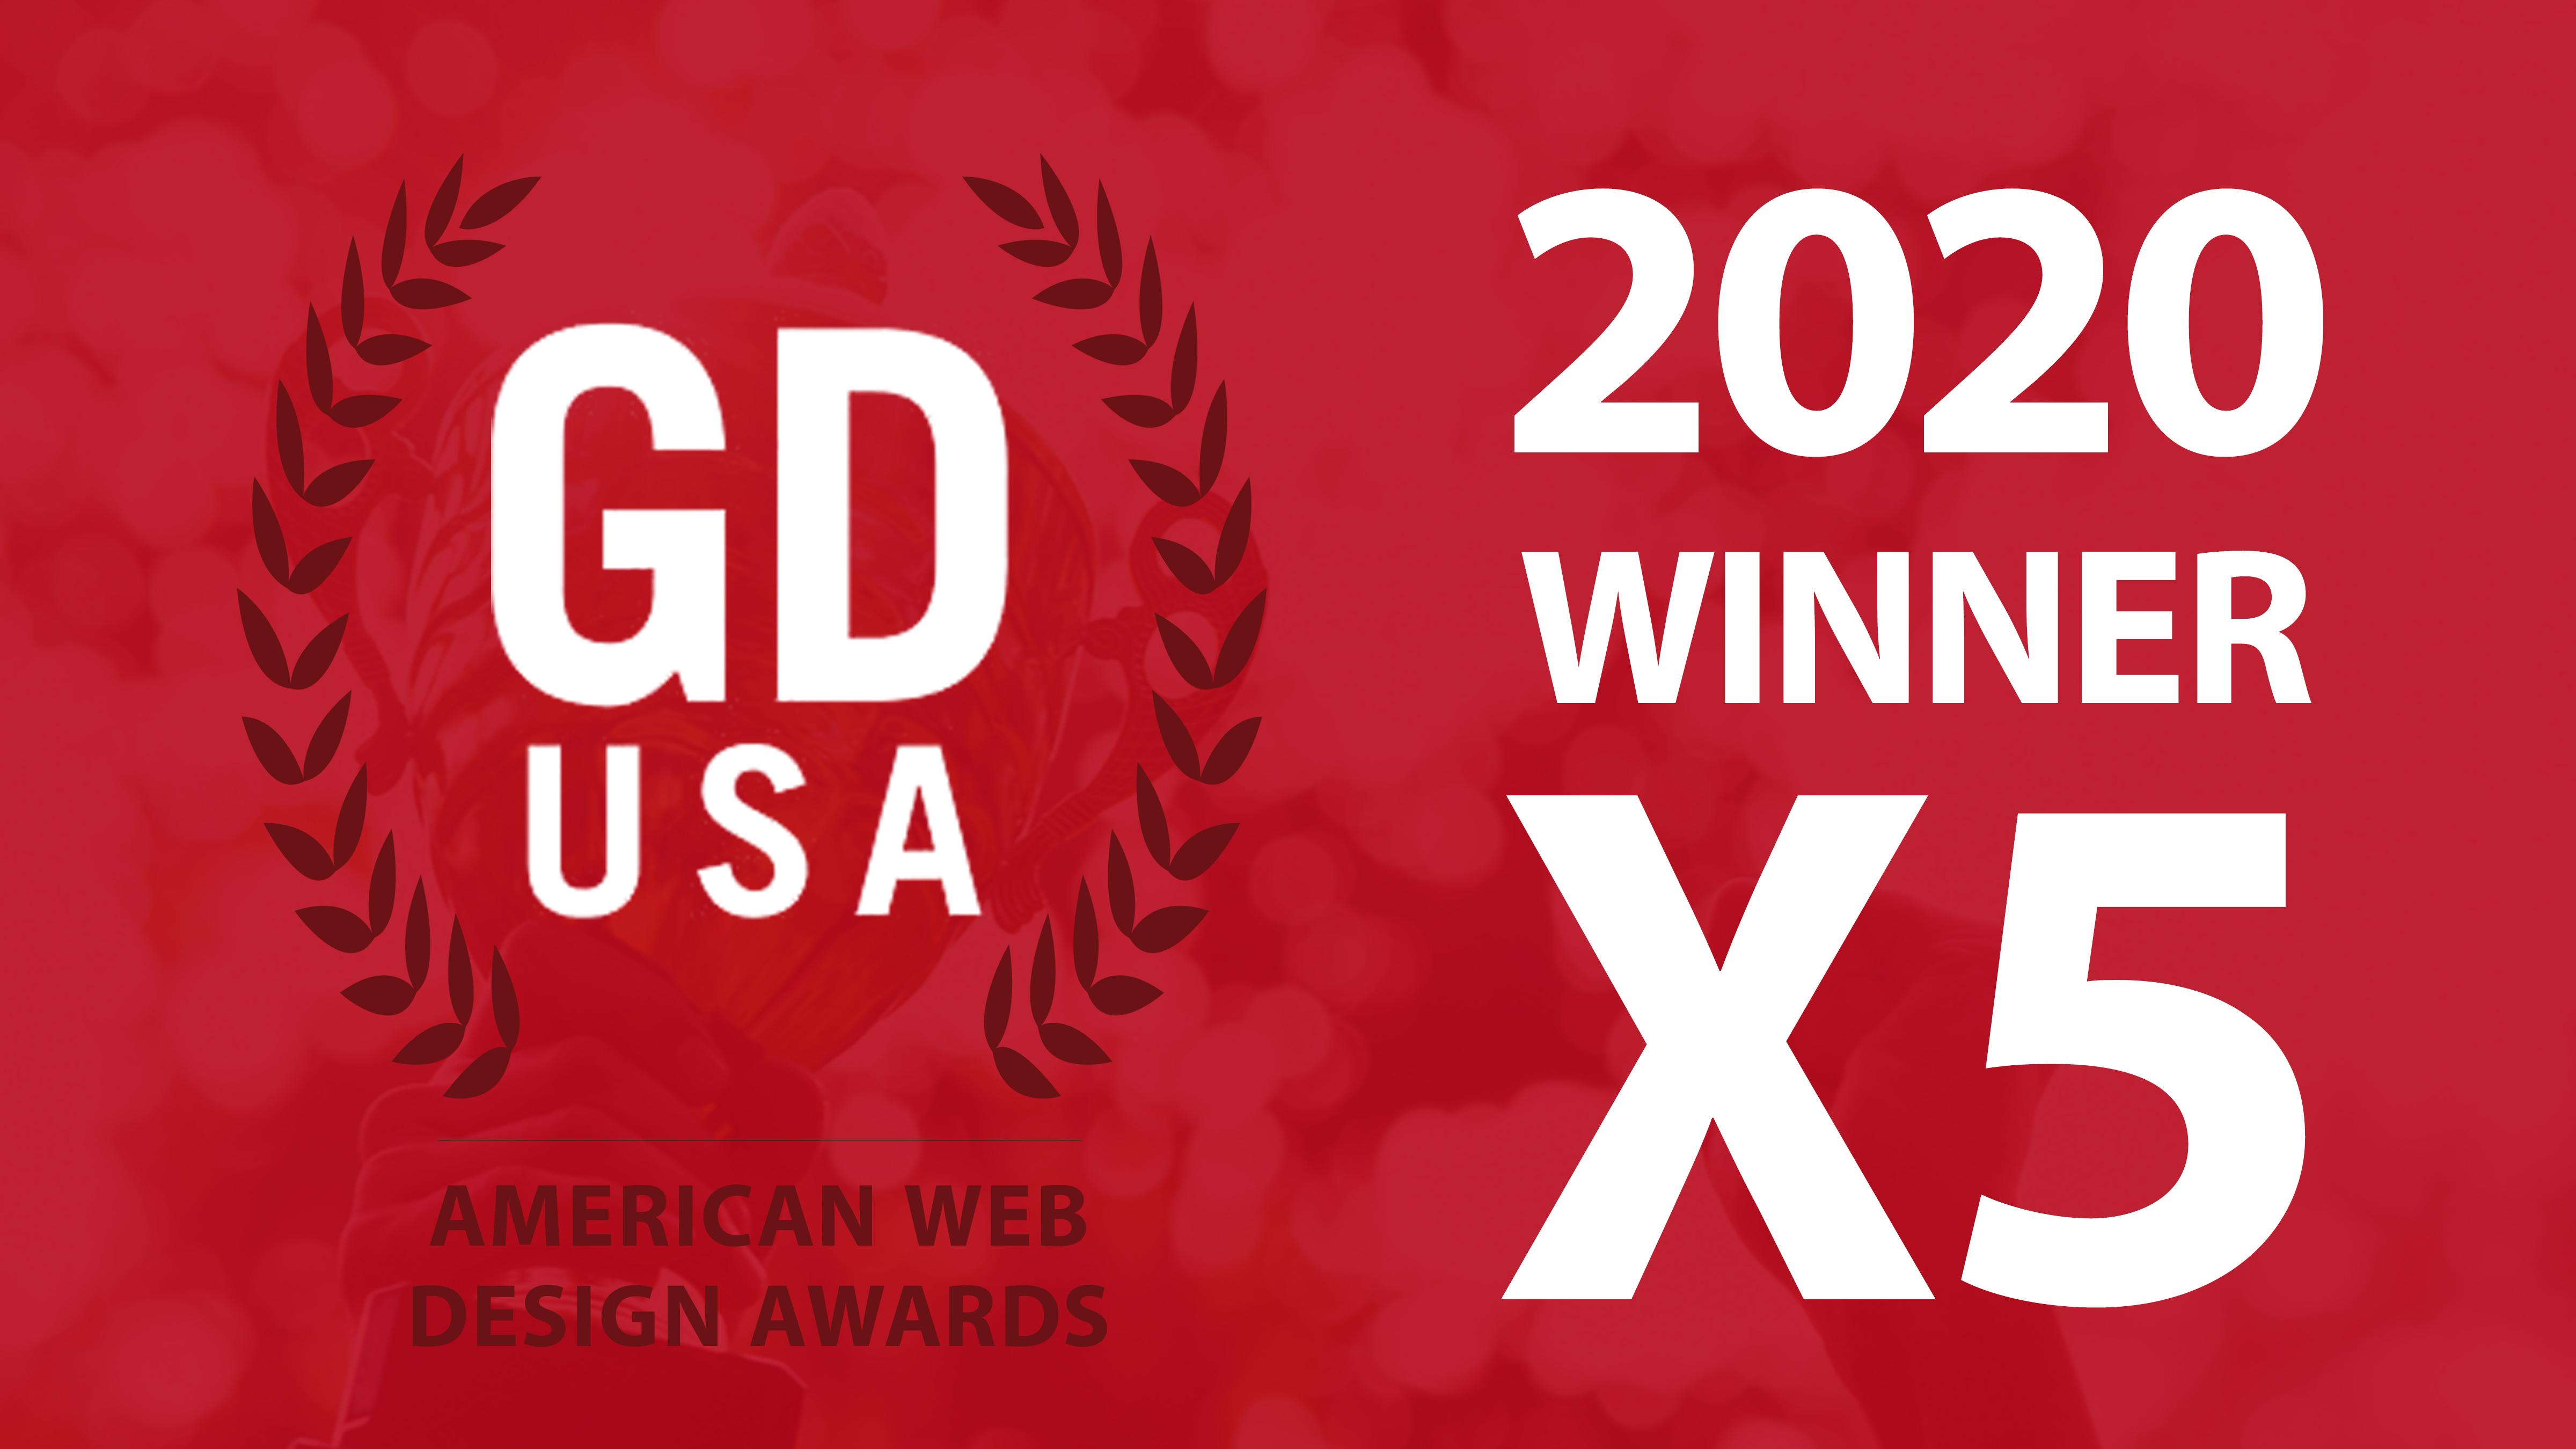 GDUSA 2020 Winner Image